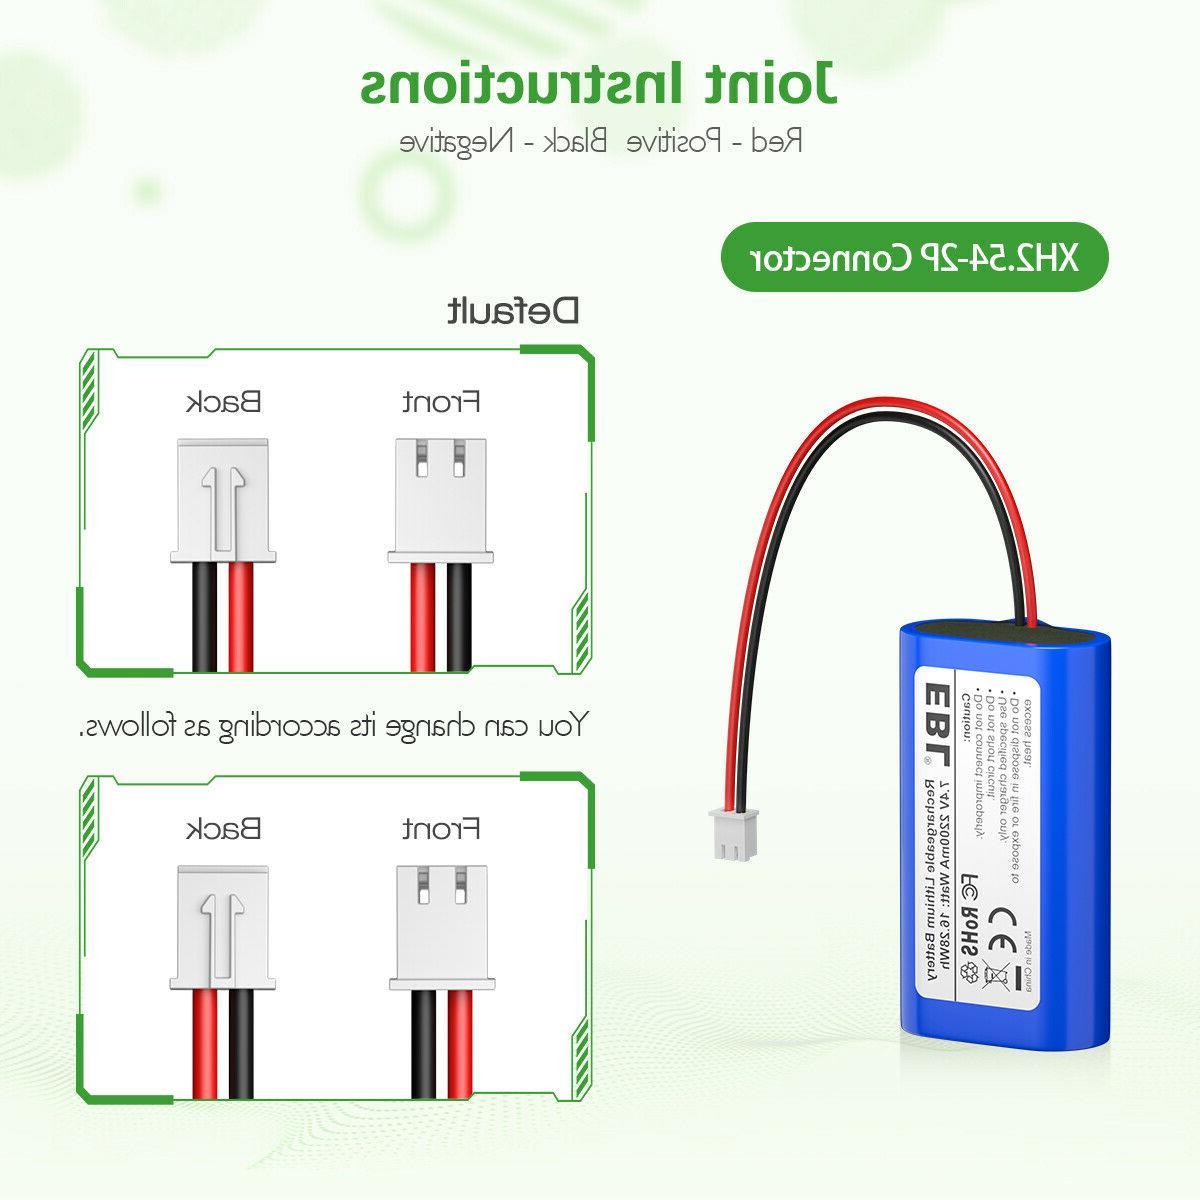 EBL Li-ion Rechargeable Batteries Replacement Toys